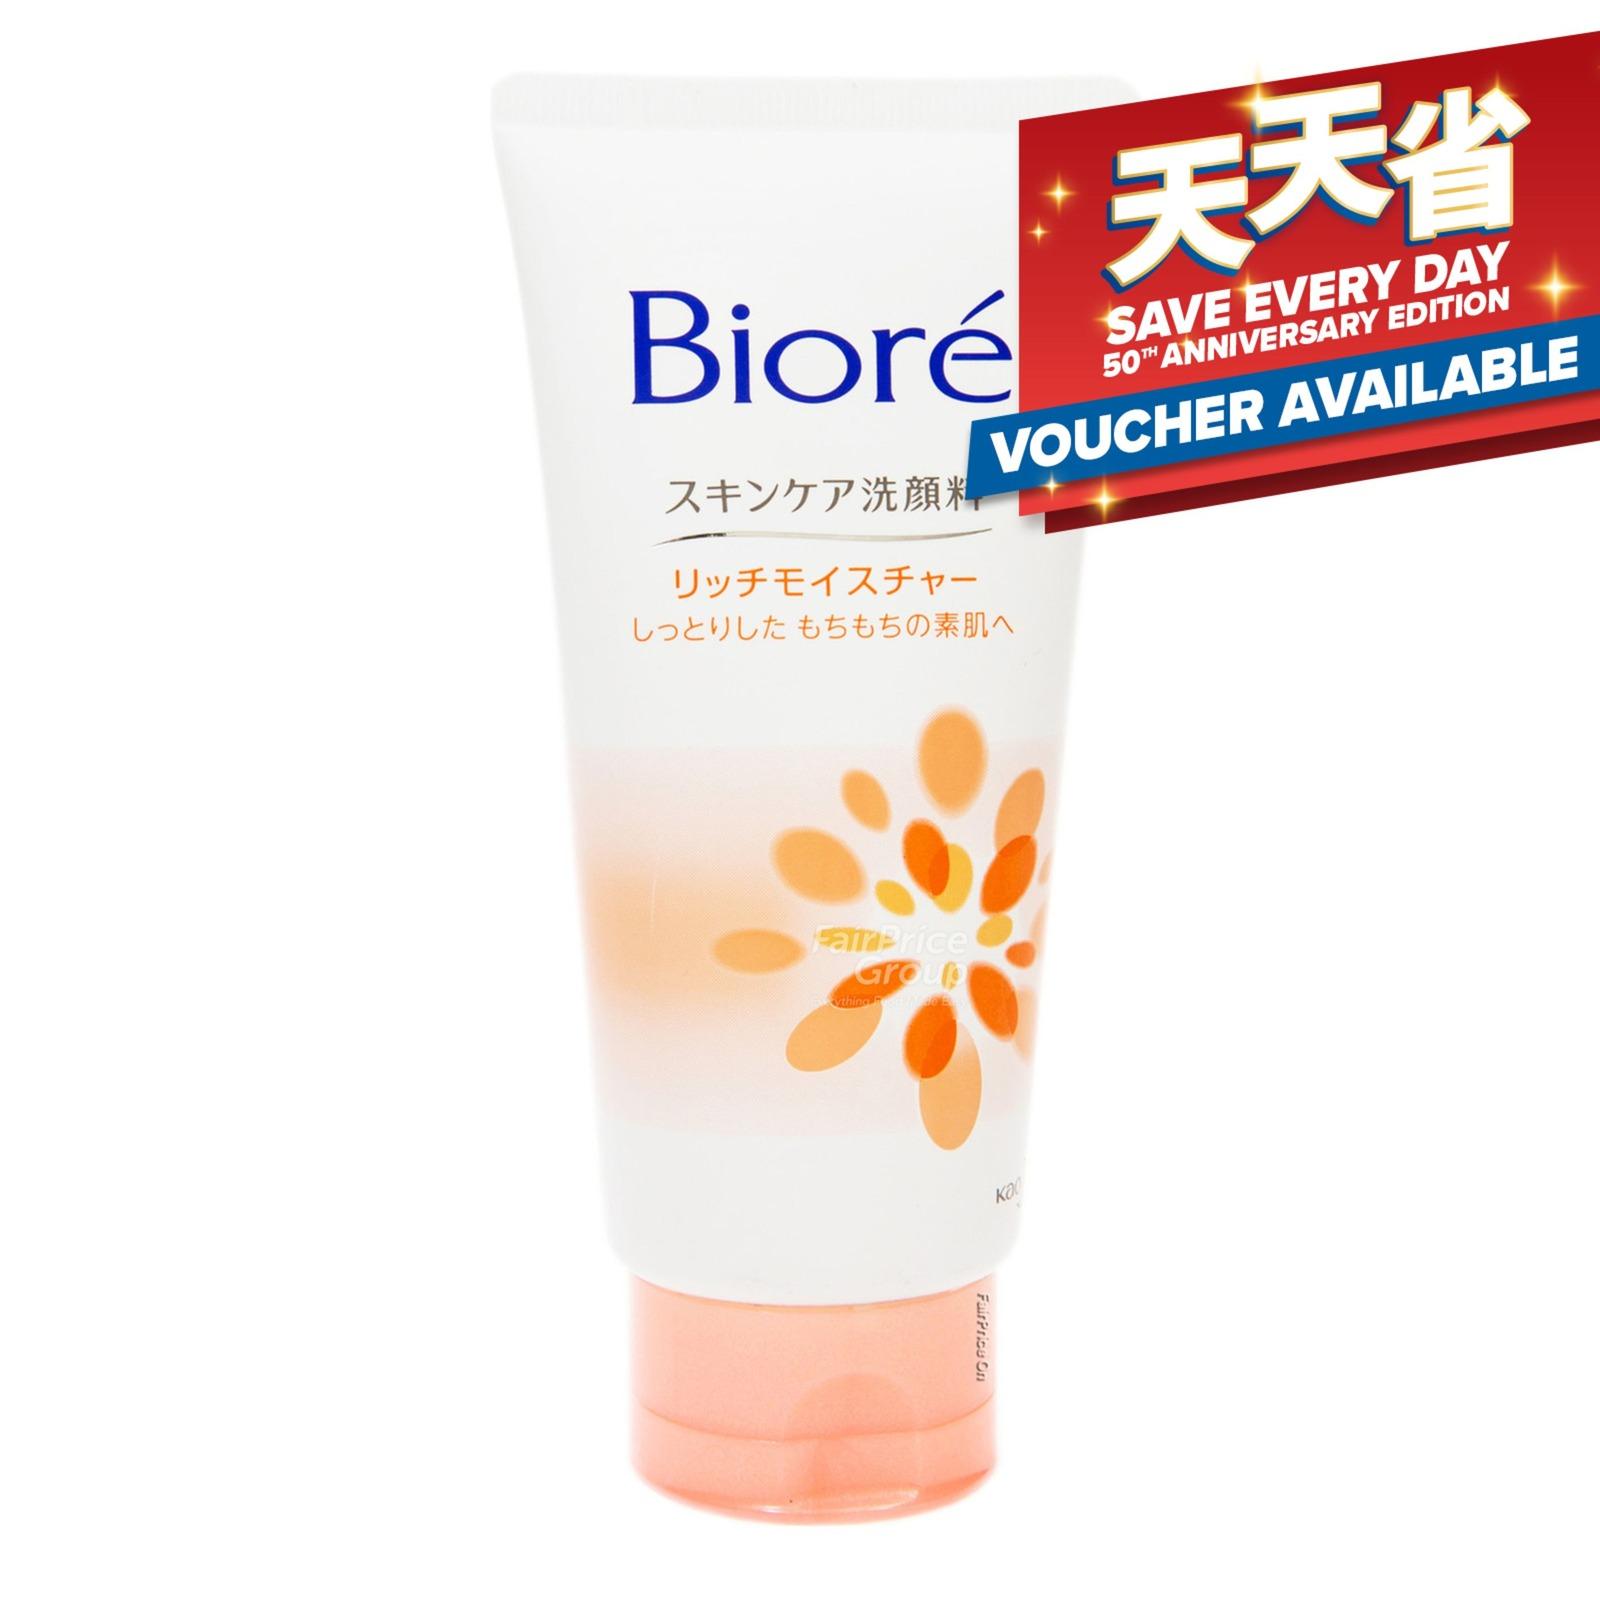 BIORE  facial foam extra moist 130g